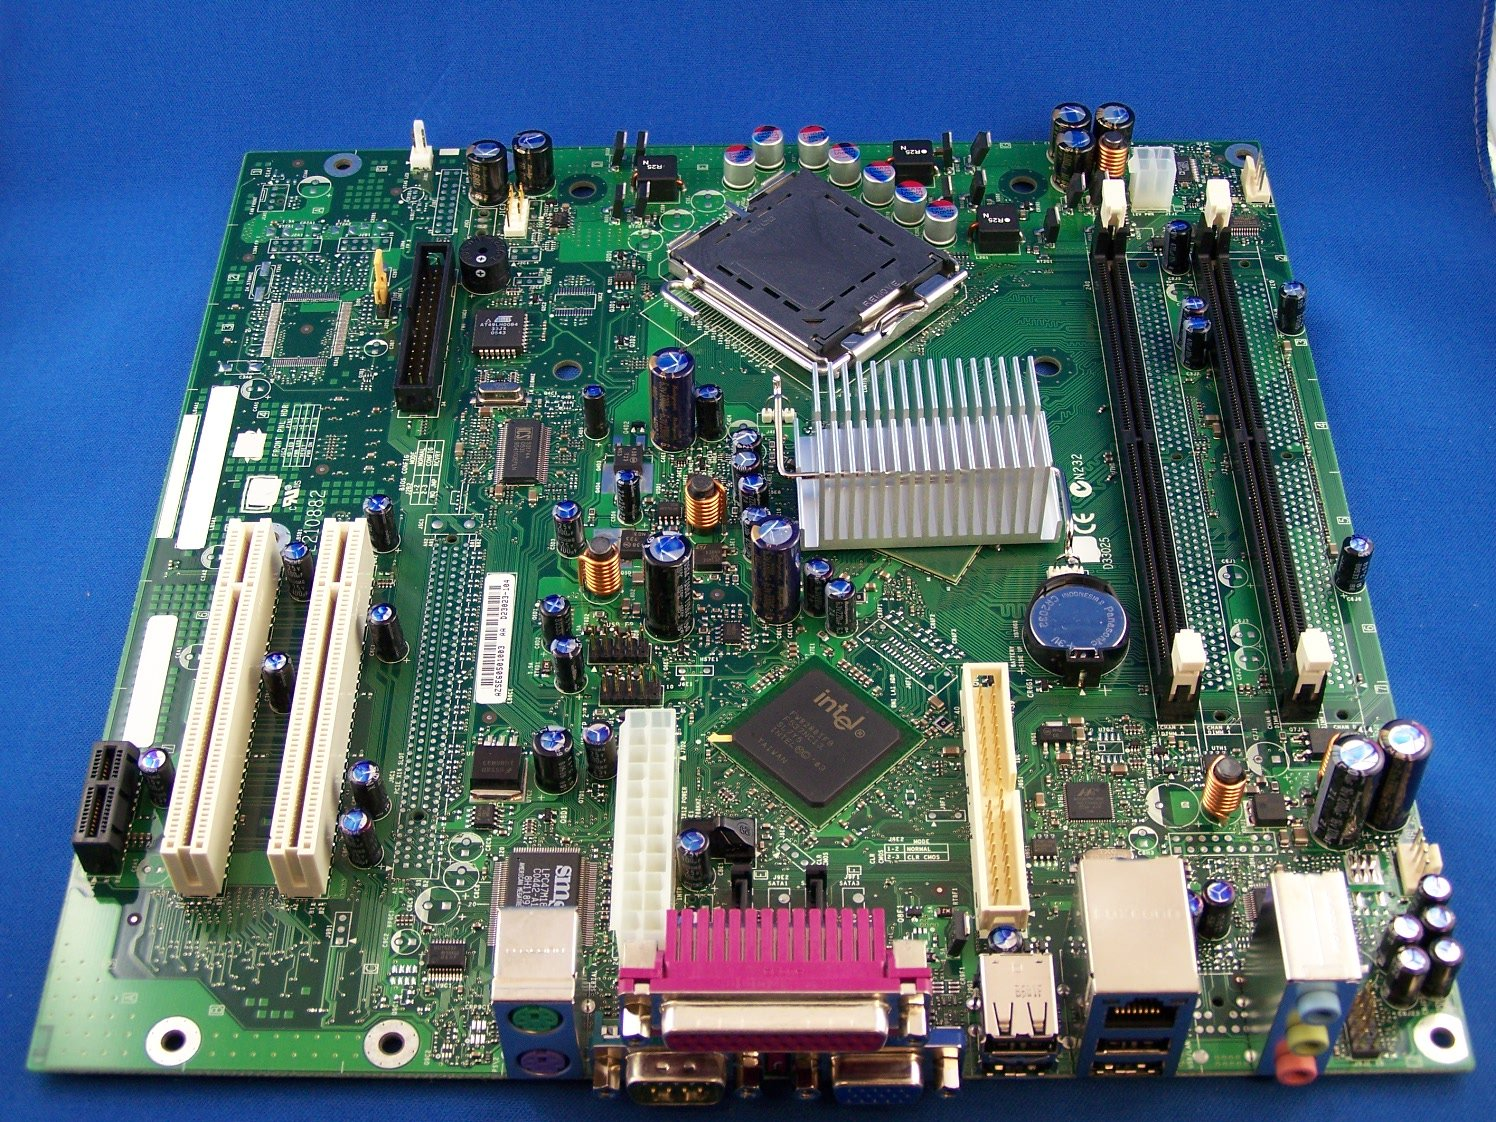 ADAPTEC SCSI CARD 29320LP ULTRA320 WINDOWS 7 DRIVERS DOWNLOAD (2019)